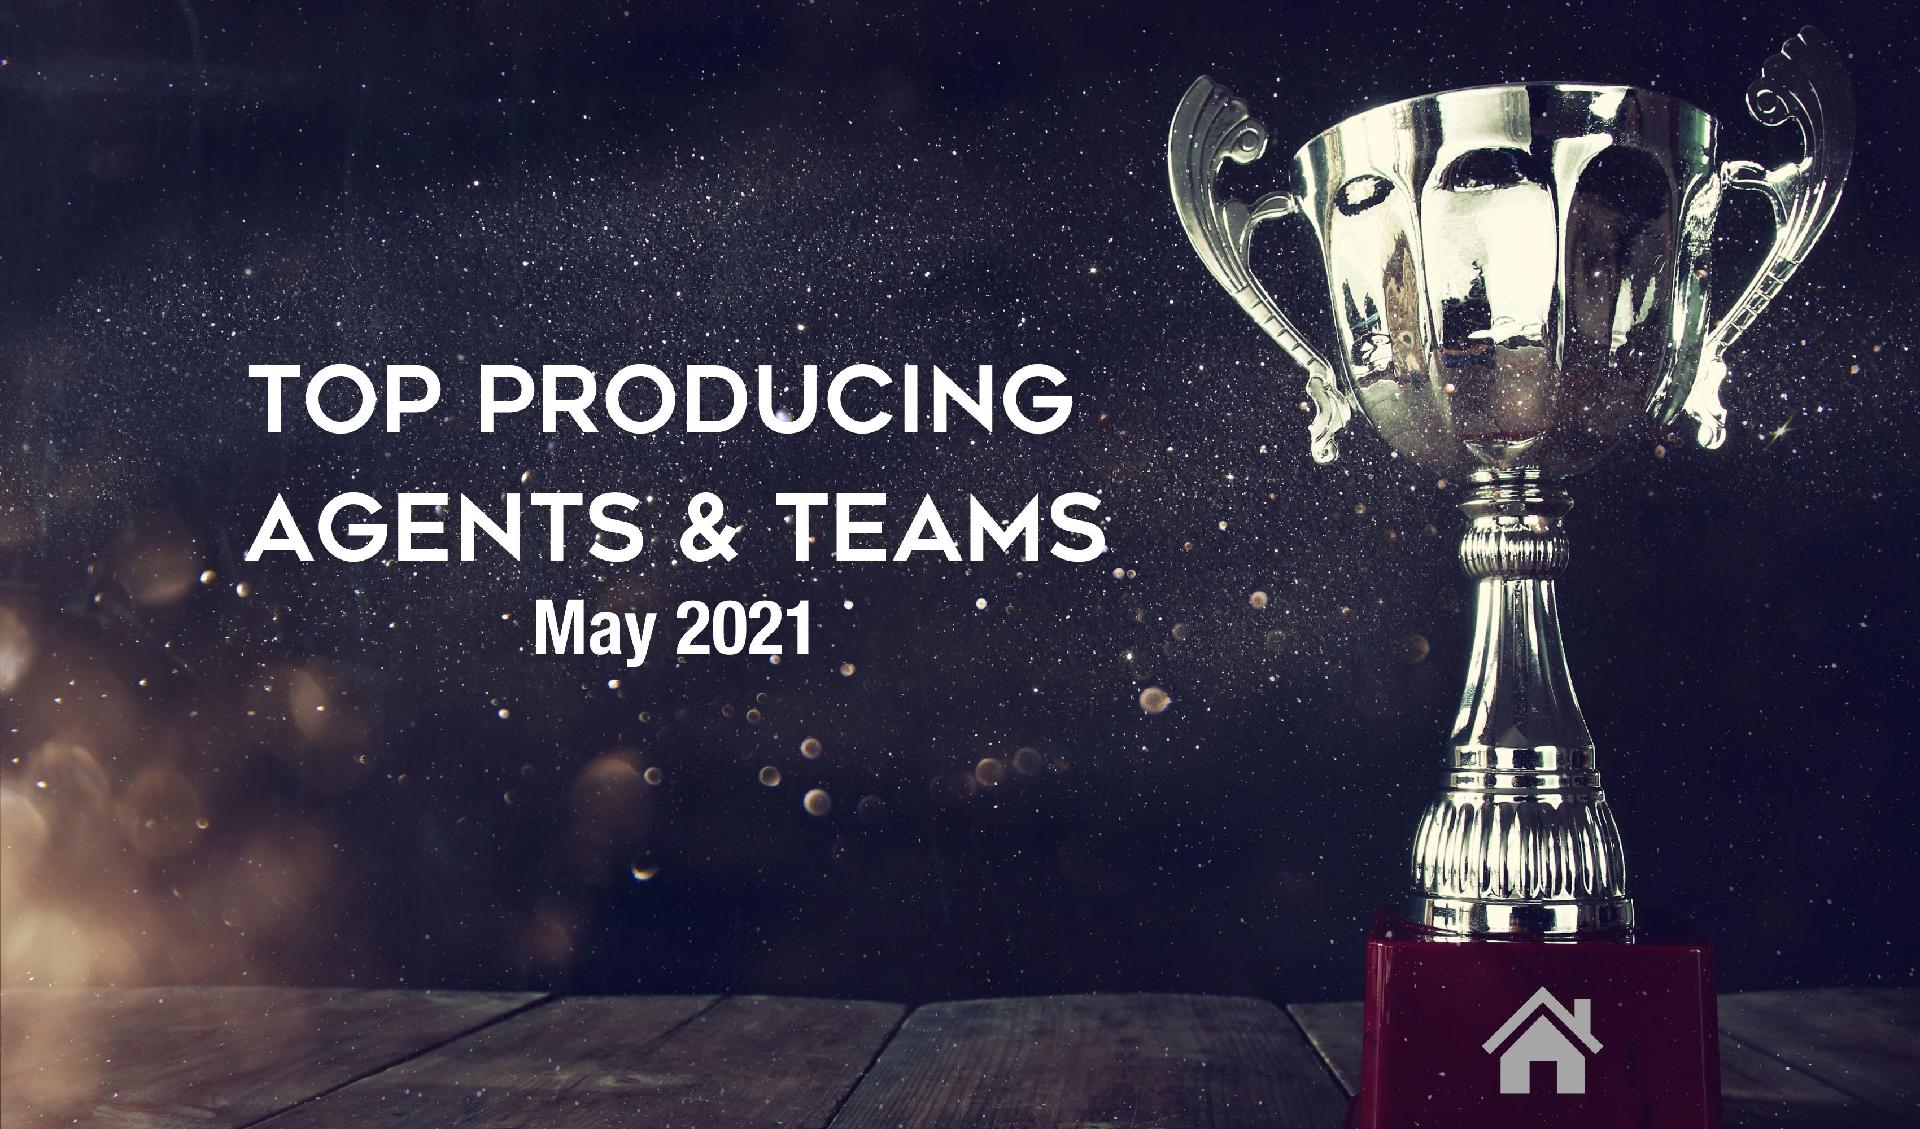 CONGRATULATIONS Top Agents & Teams! Picture